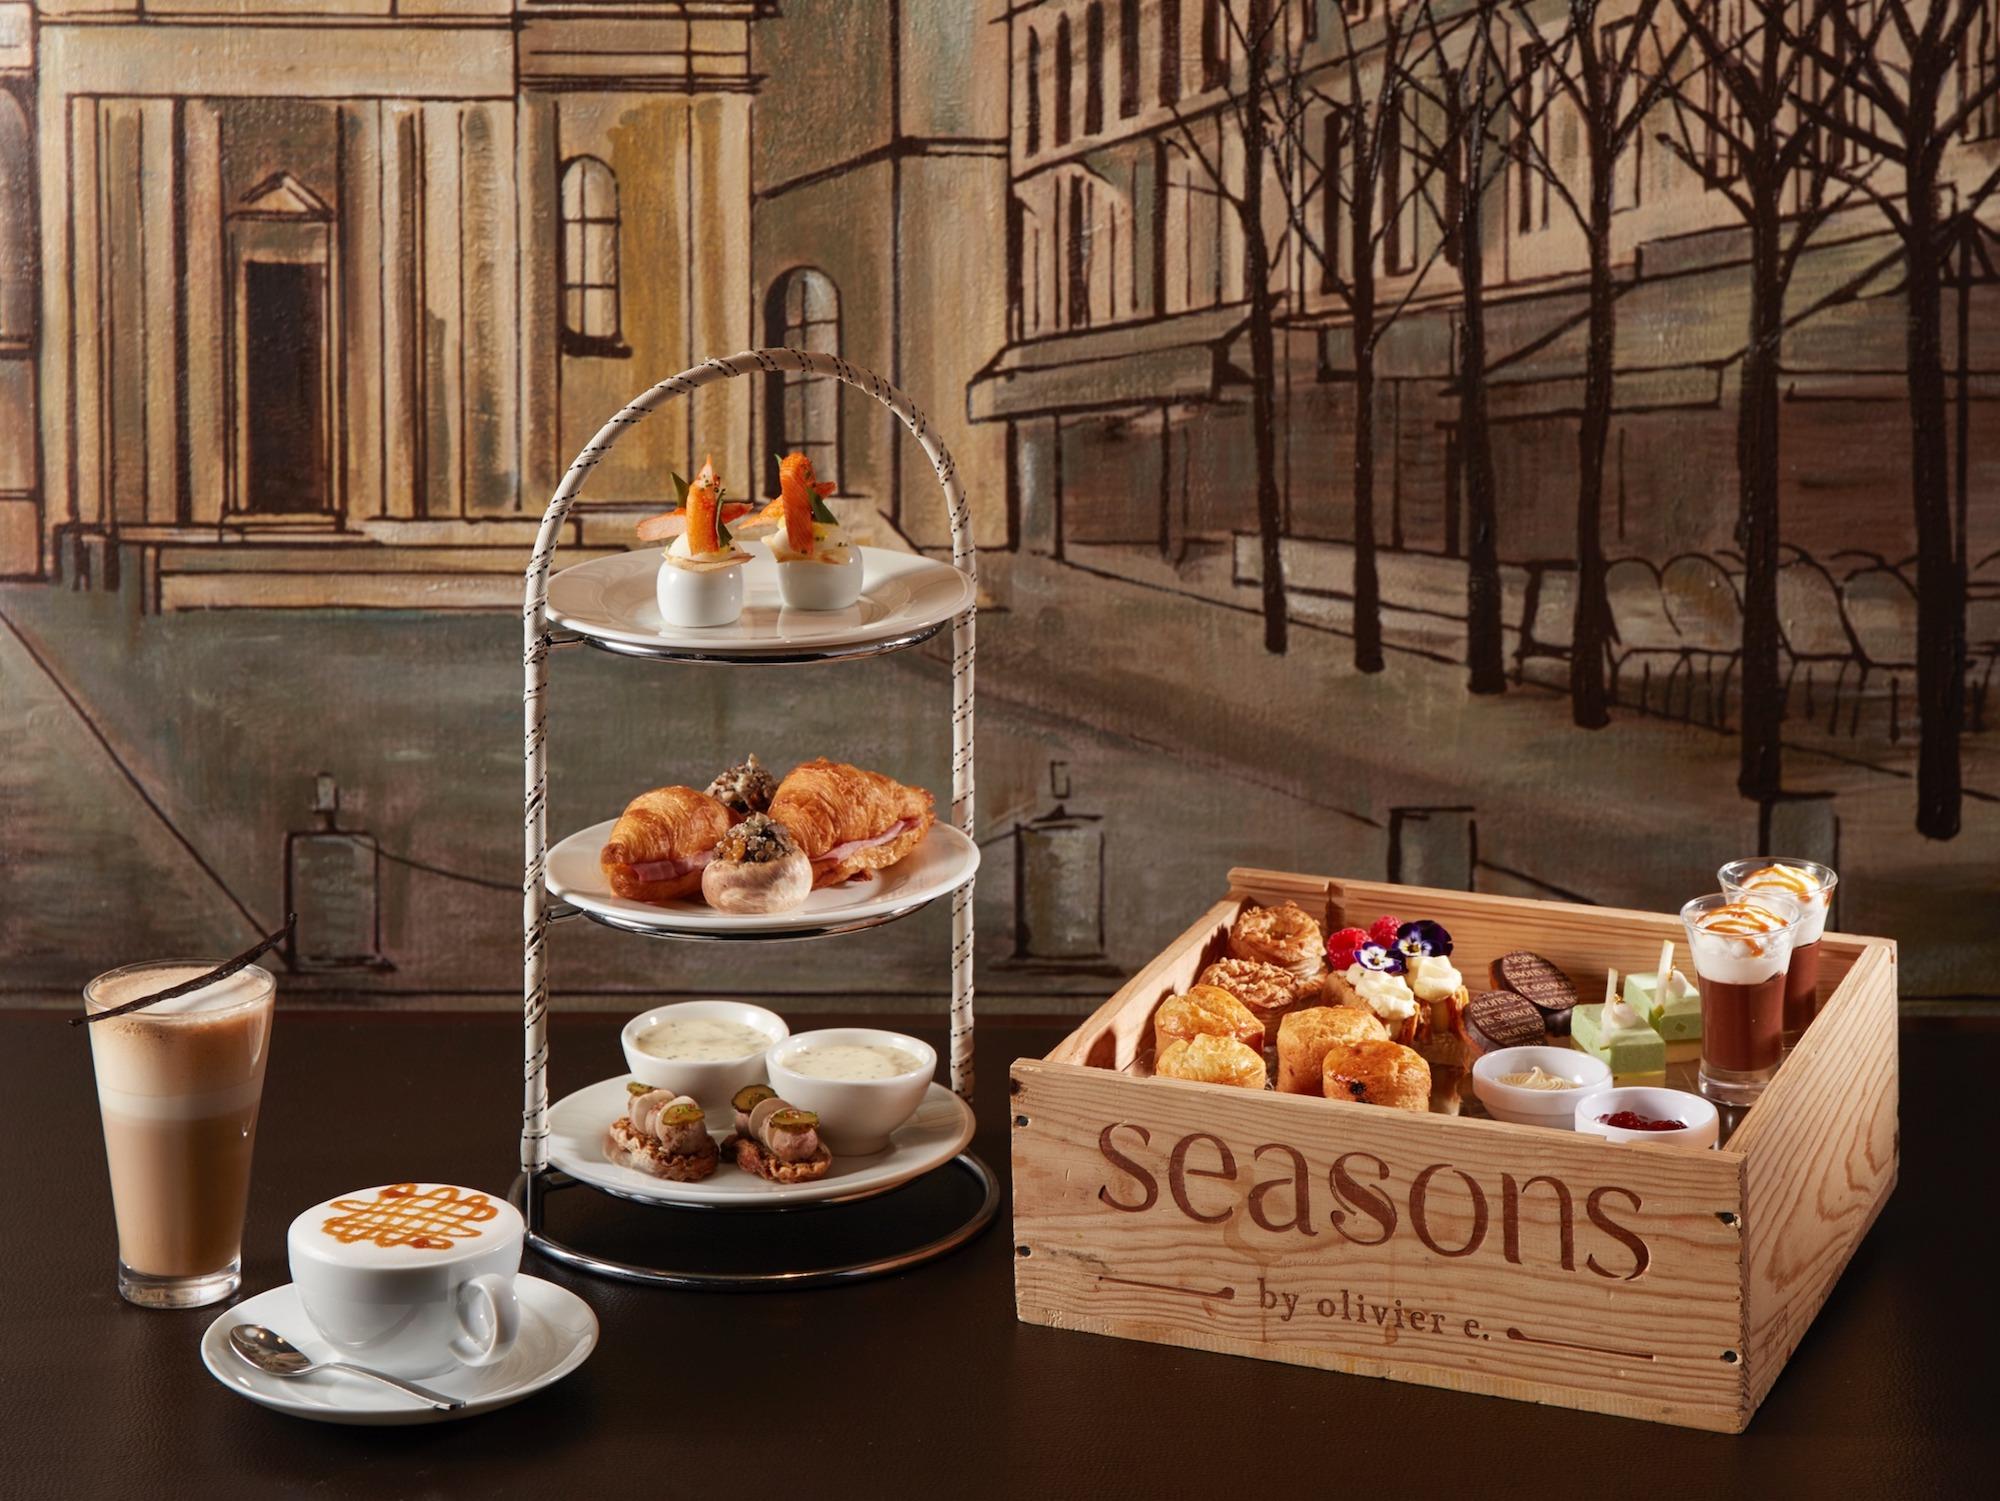 Seasons by Olivier E